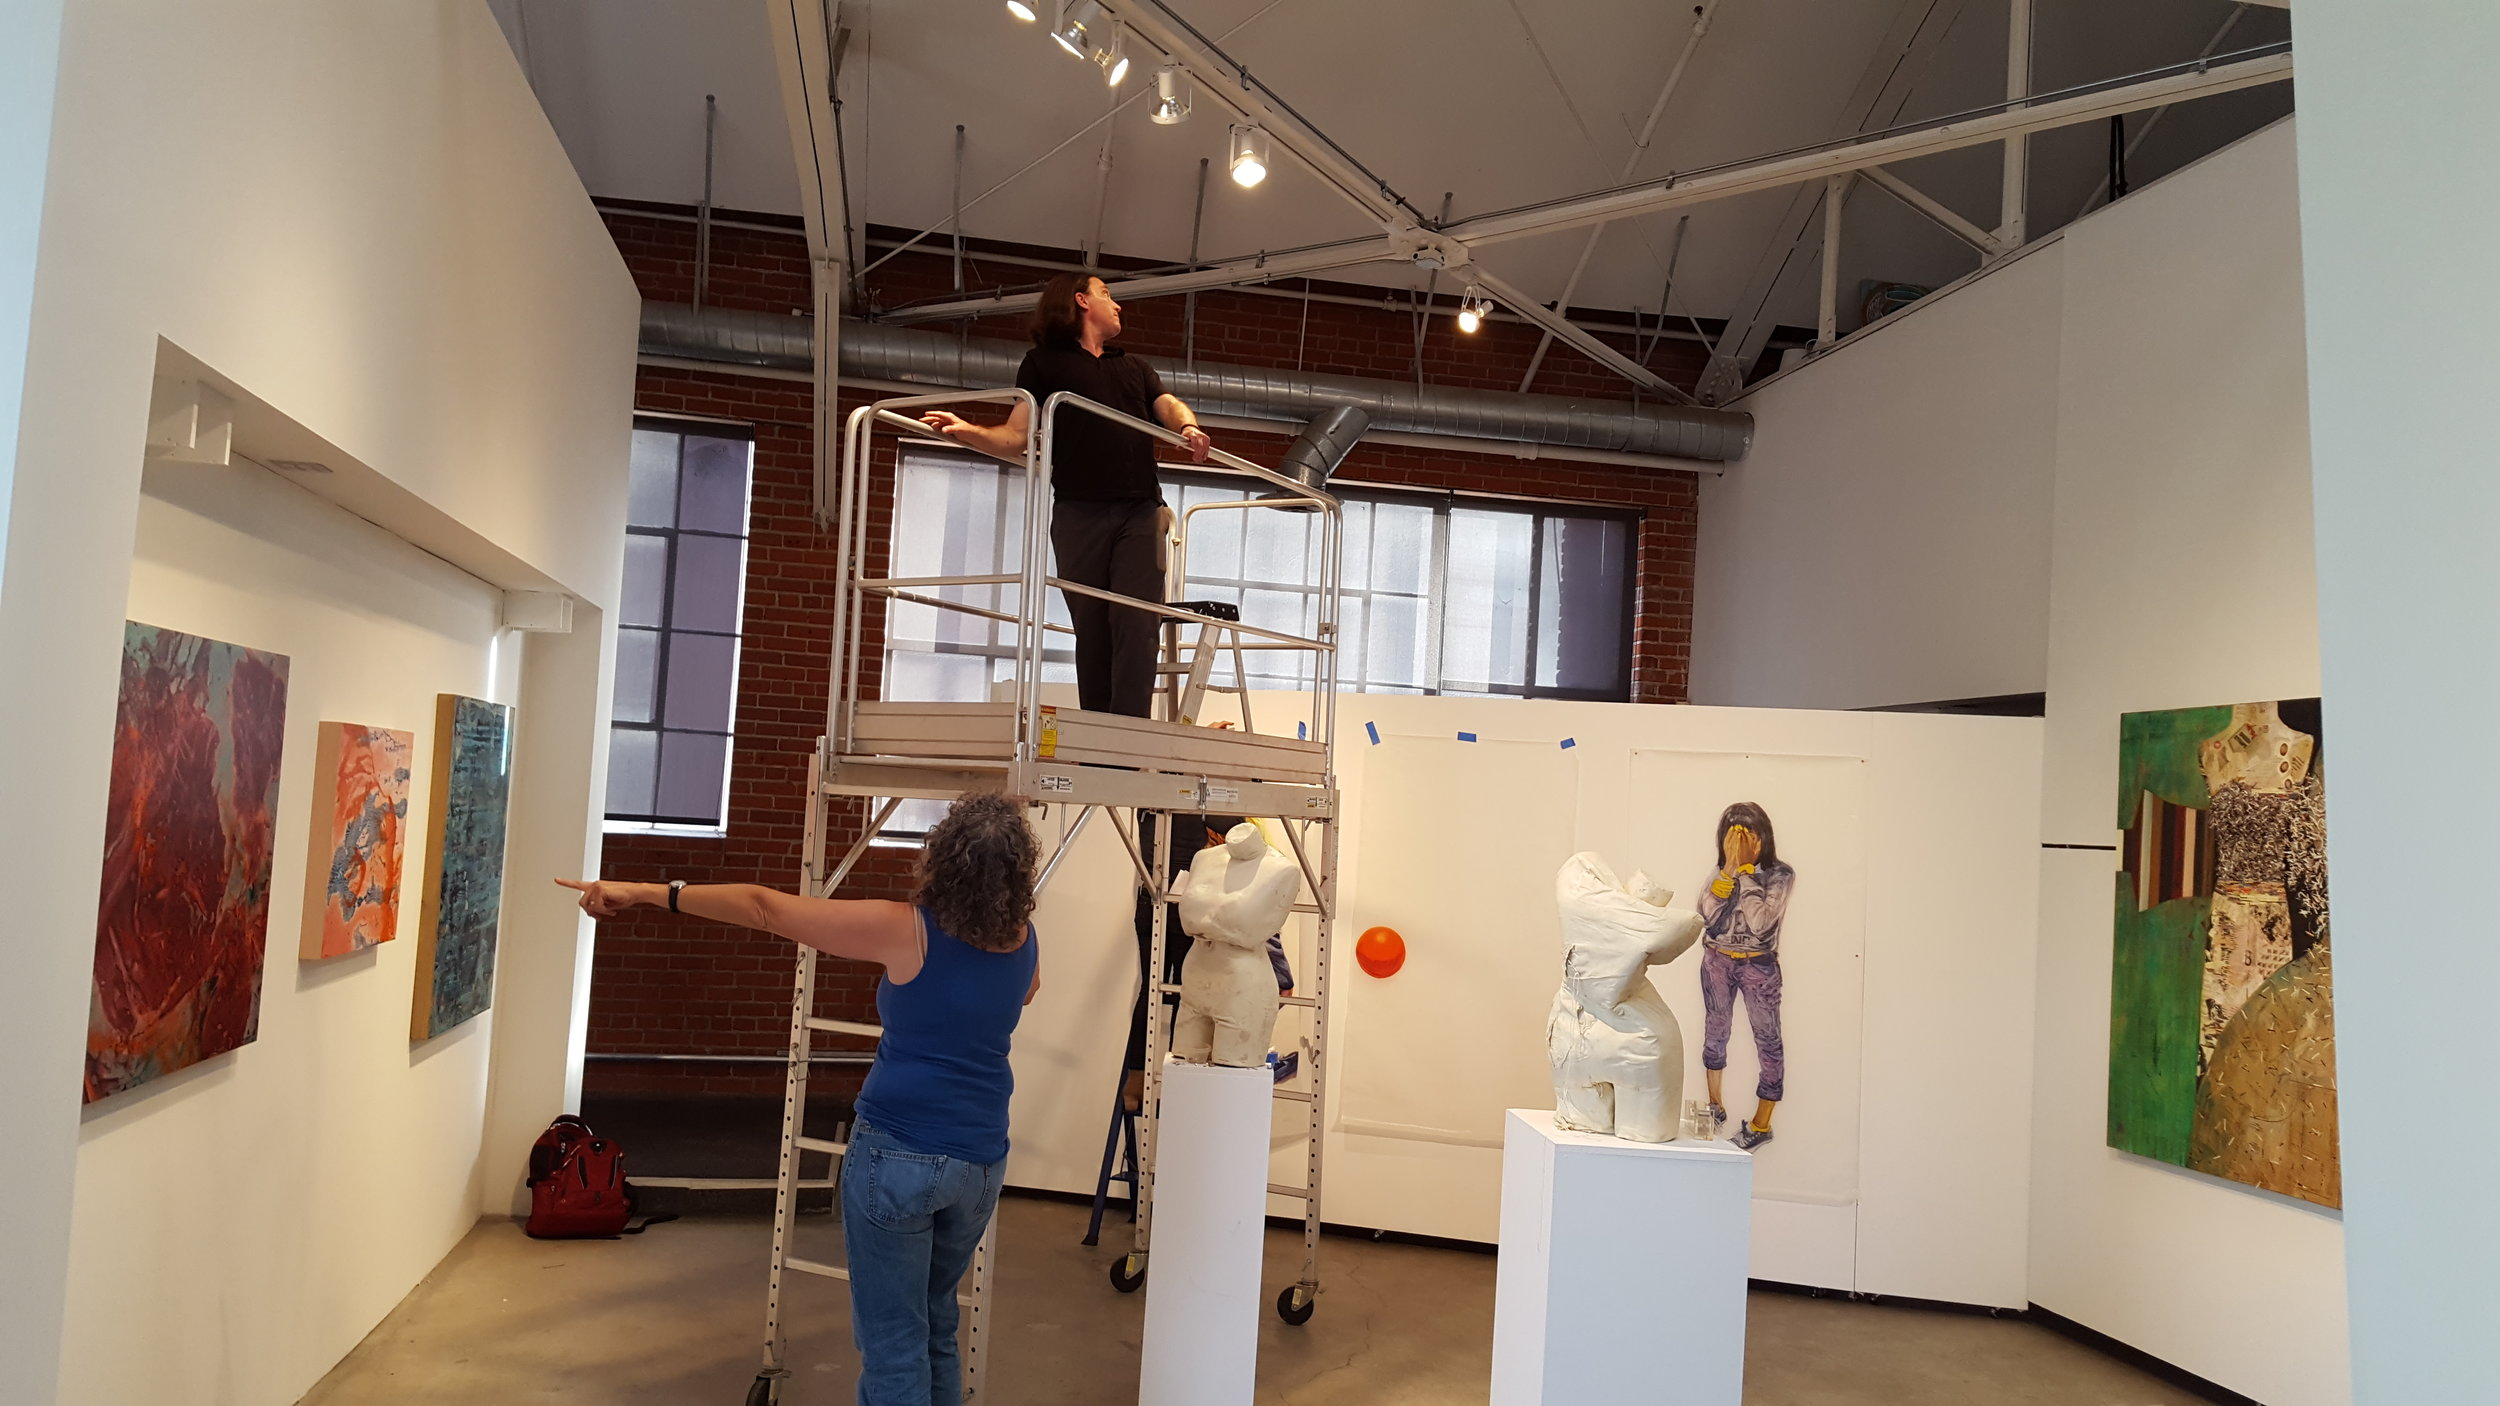 Adjusting the lights. Pictured: Jeanie Frias & David Goetz (on scaffolding). |  Photo credit: C. Rasmussen.